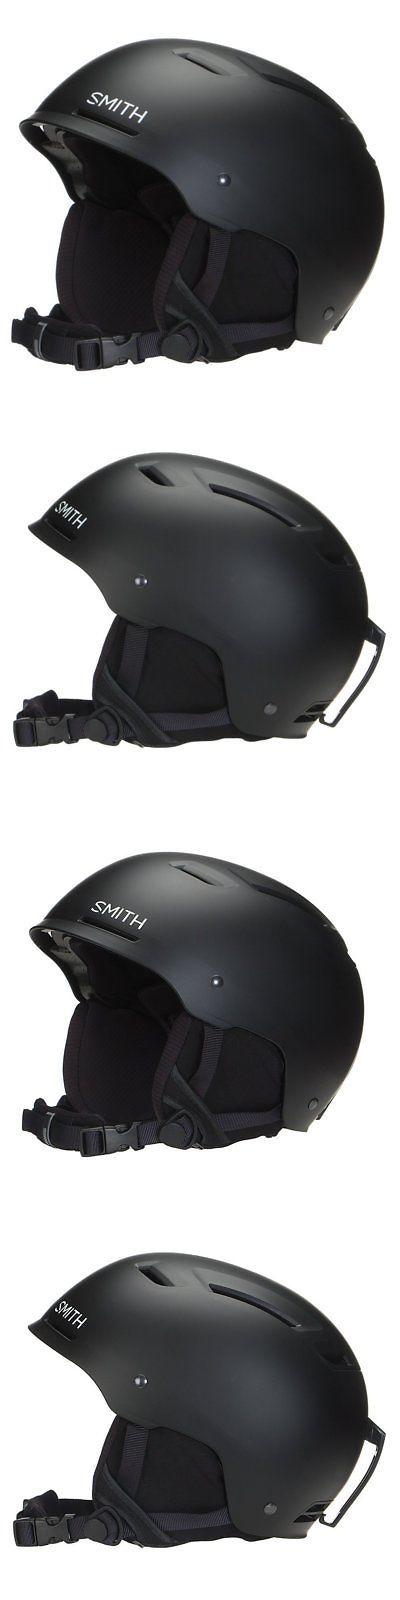 Protective Gear 36260: Smith Optics Pivot Adult Ski Snowmobile Helmet - Matte Black Large -> BUY IT NOW ONLY: $81.37 on eBay!